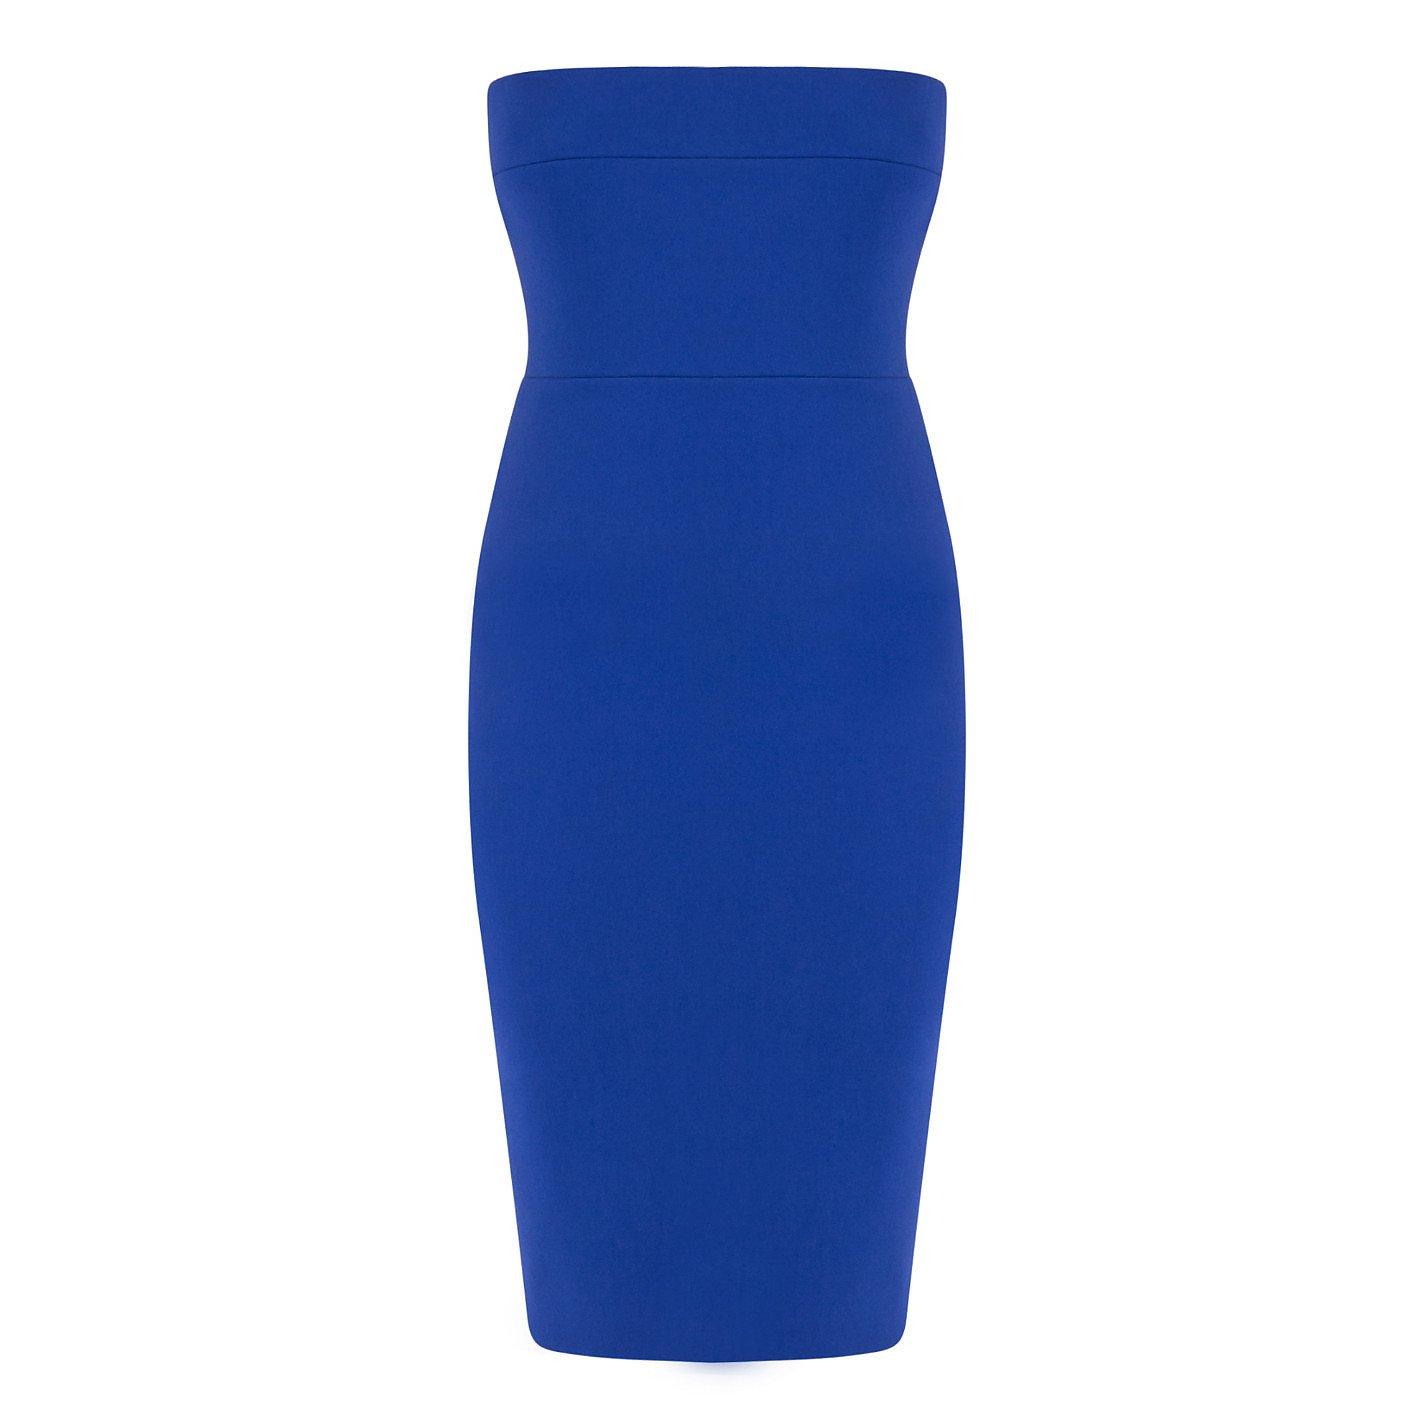 Victoria Beckham Matte Crepe Fitted Corset Dress